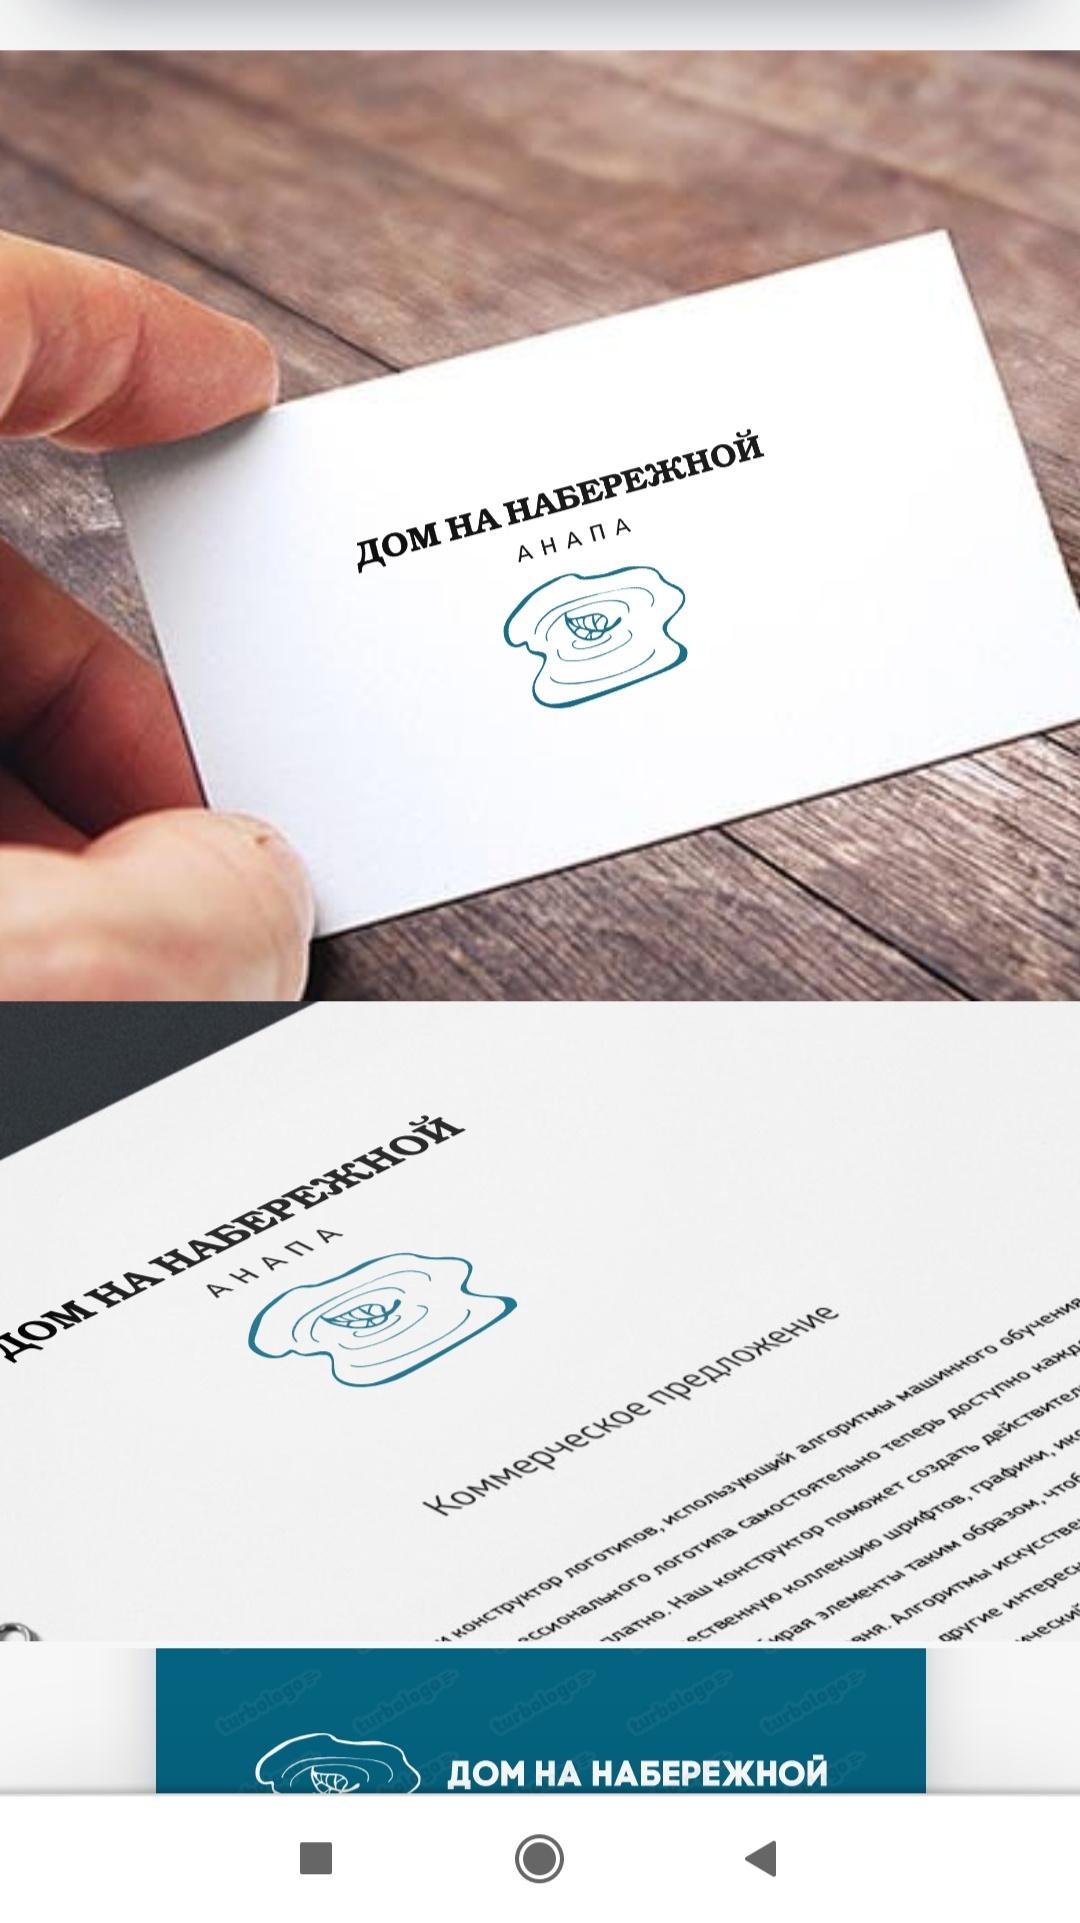 РАЗРАБОТКА логотипа для ЖИЛОГО КОМПЛЕКСА премиум В АНАПЕ.  фото f_4675deac57d23e10.jpg